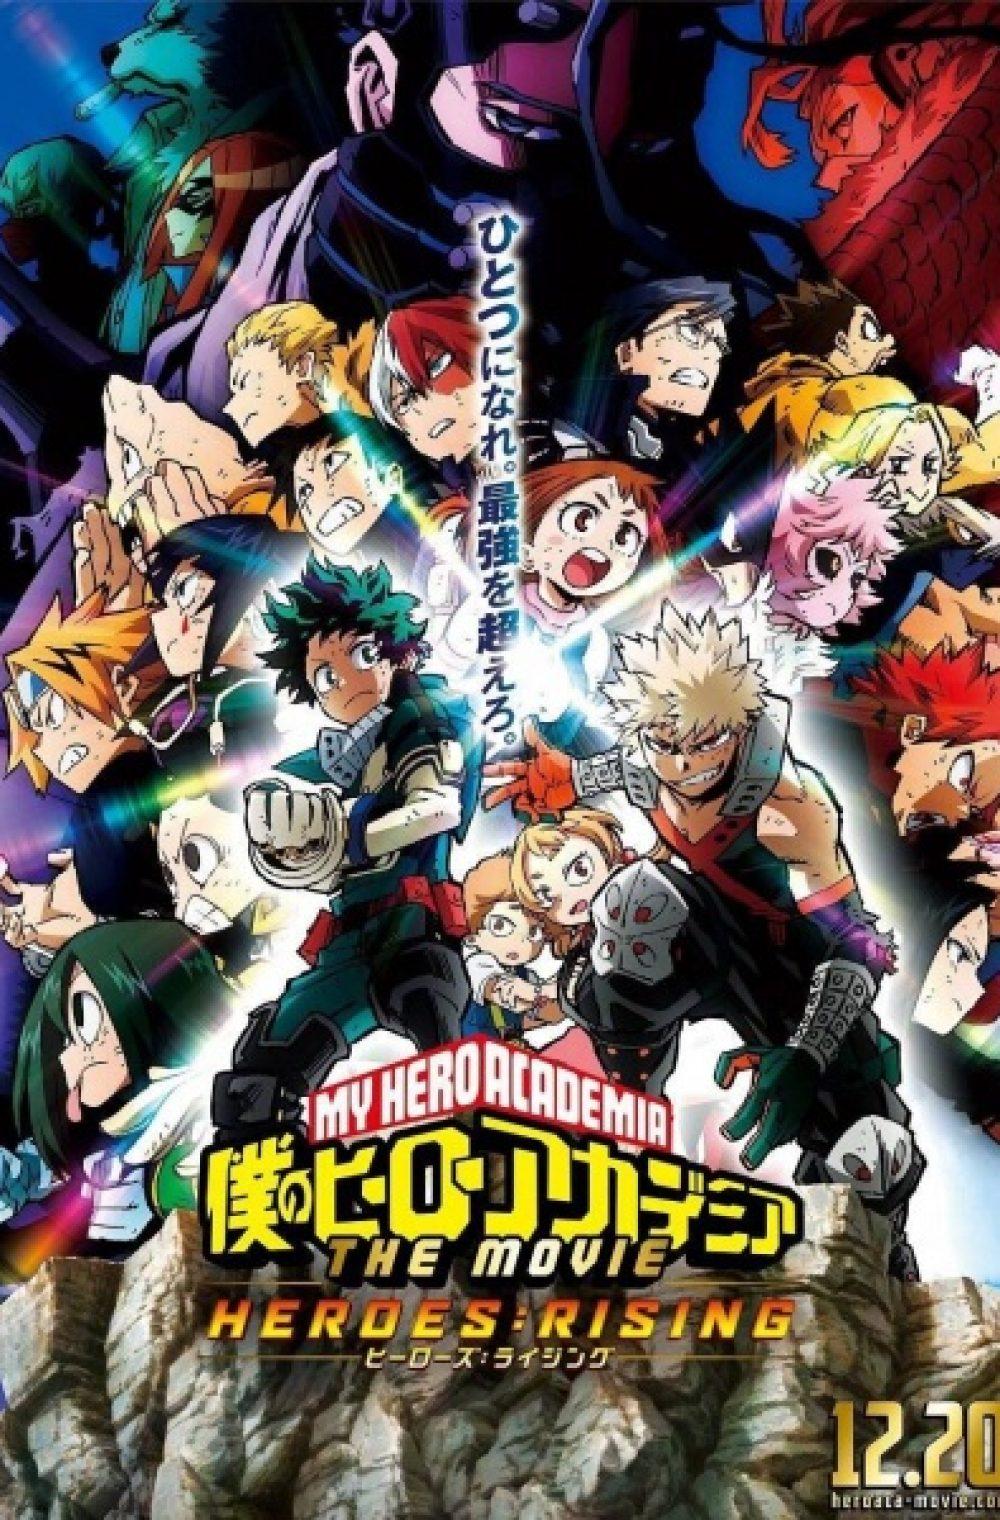 My Hero Academia: HEROES: RISING (Boku no Hero Academia the Movie 2 Heroes: Rising)